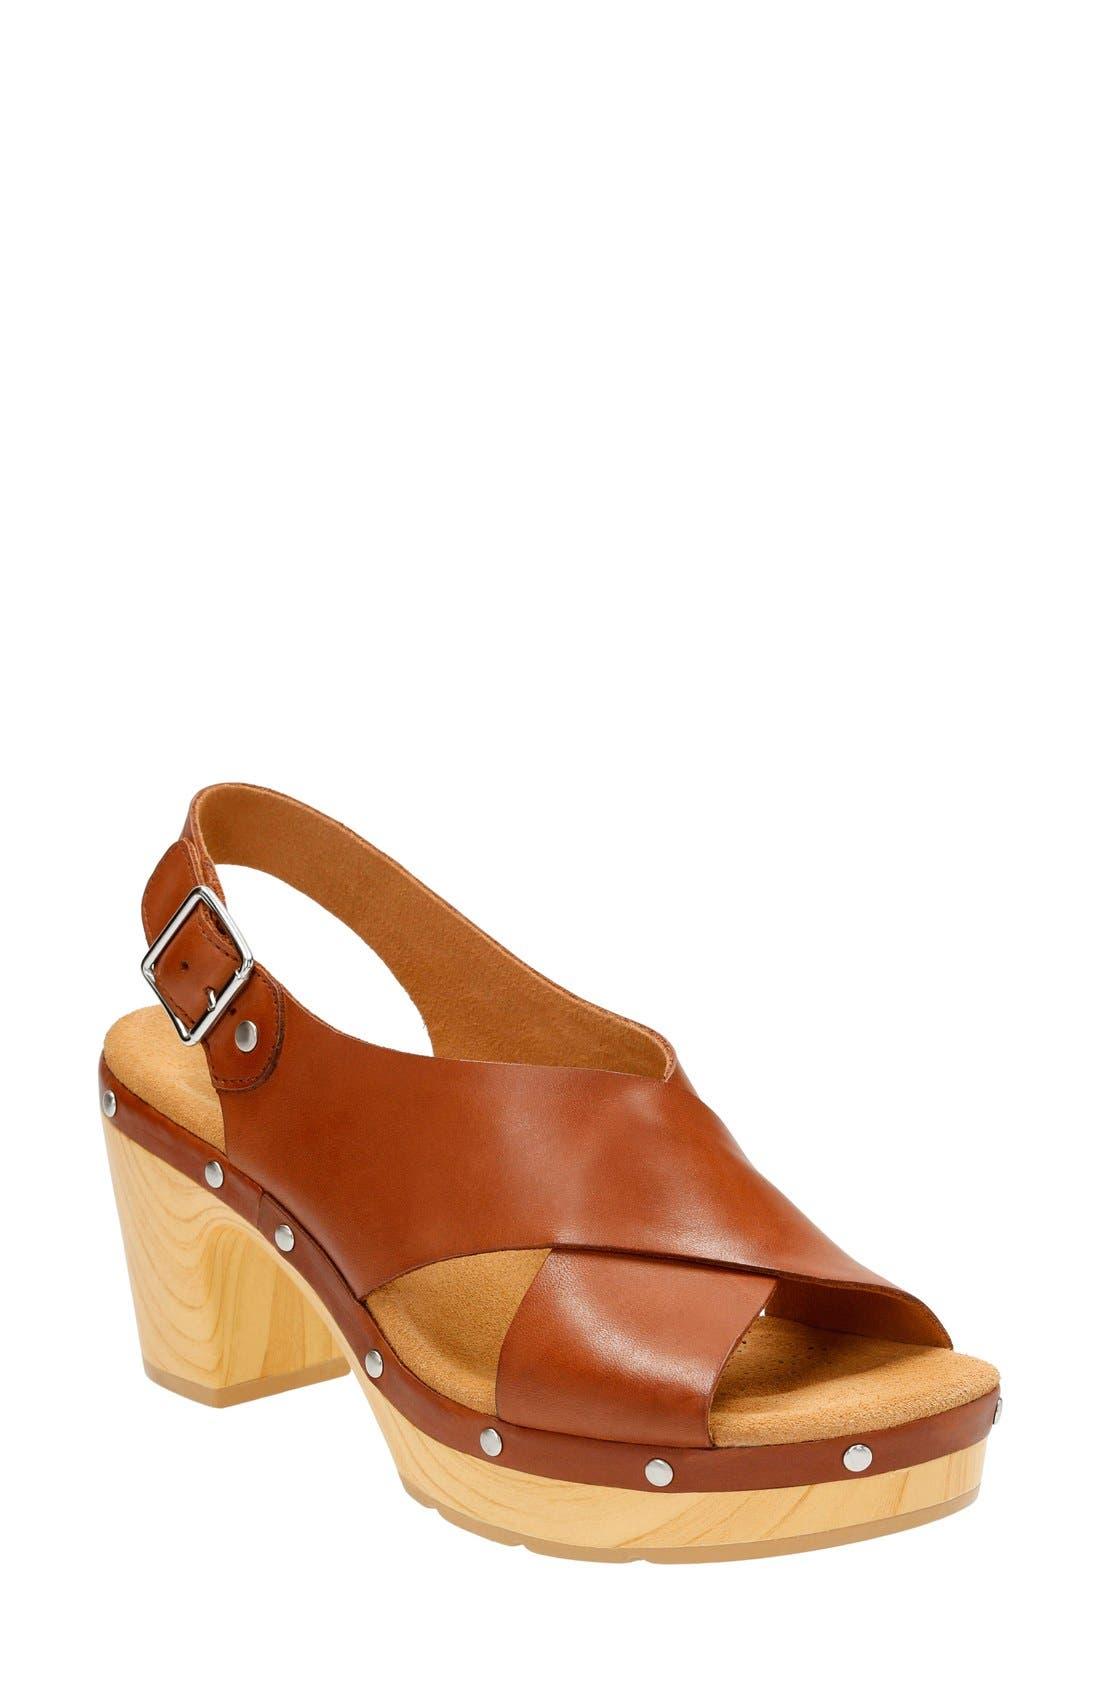 CLARKS® 'Ledella Club' Slingback Sandal